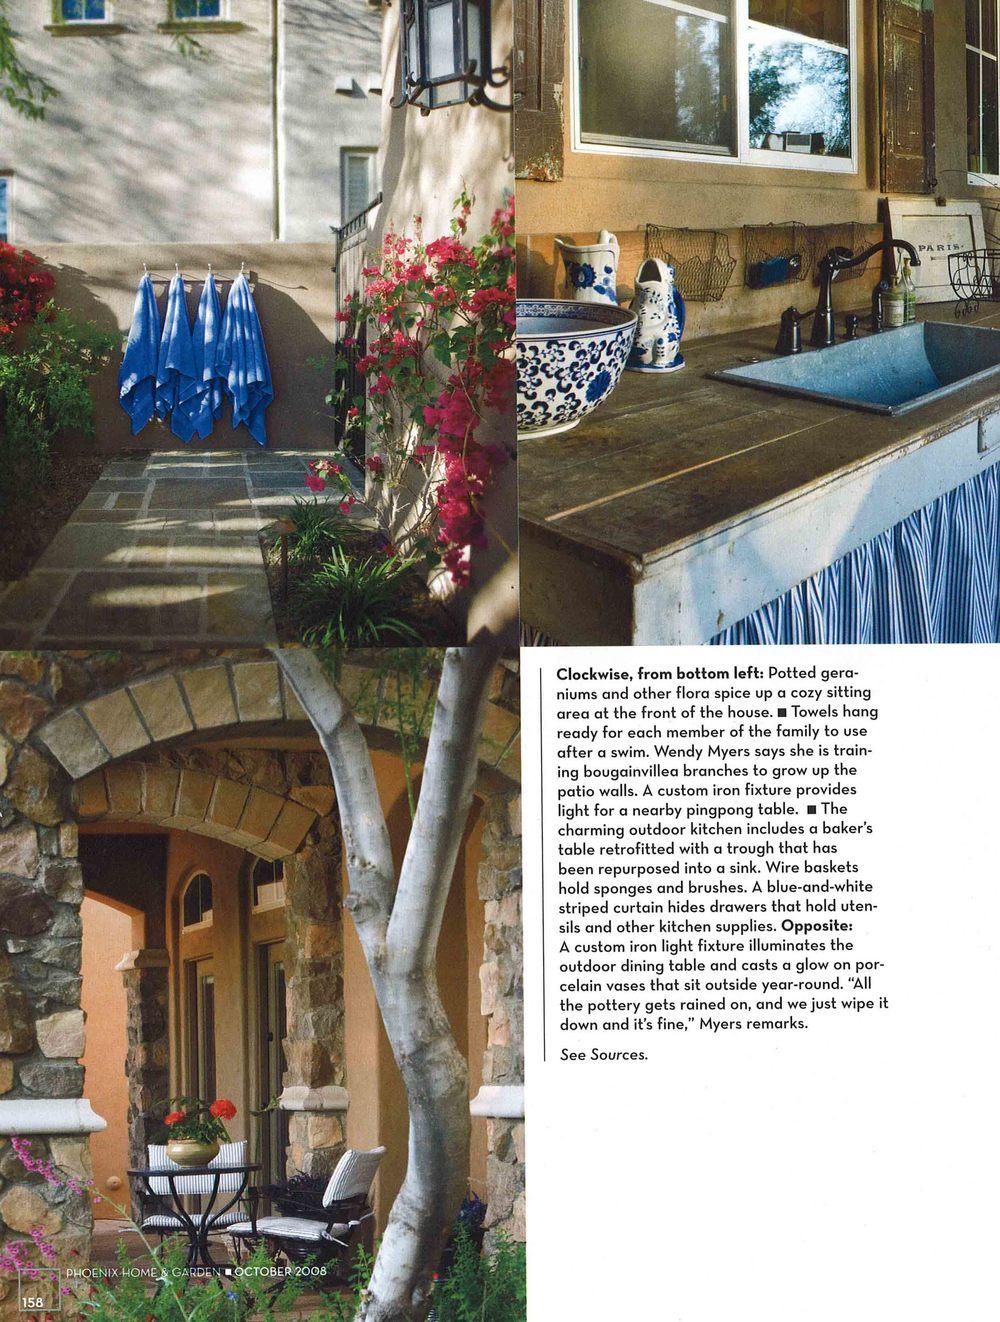 PHGoct08-pg5 72.jpg